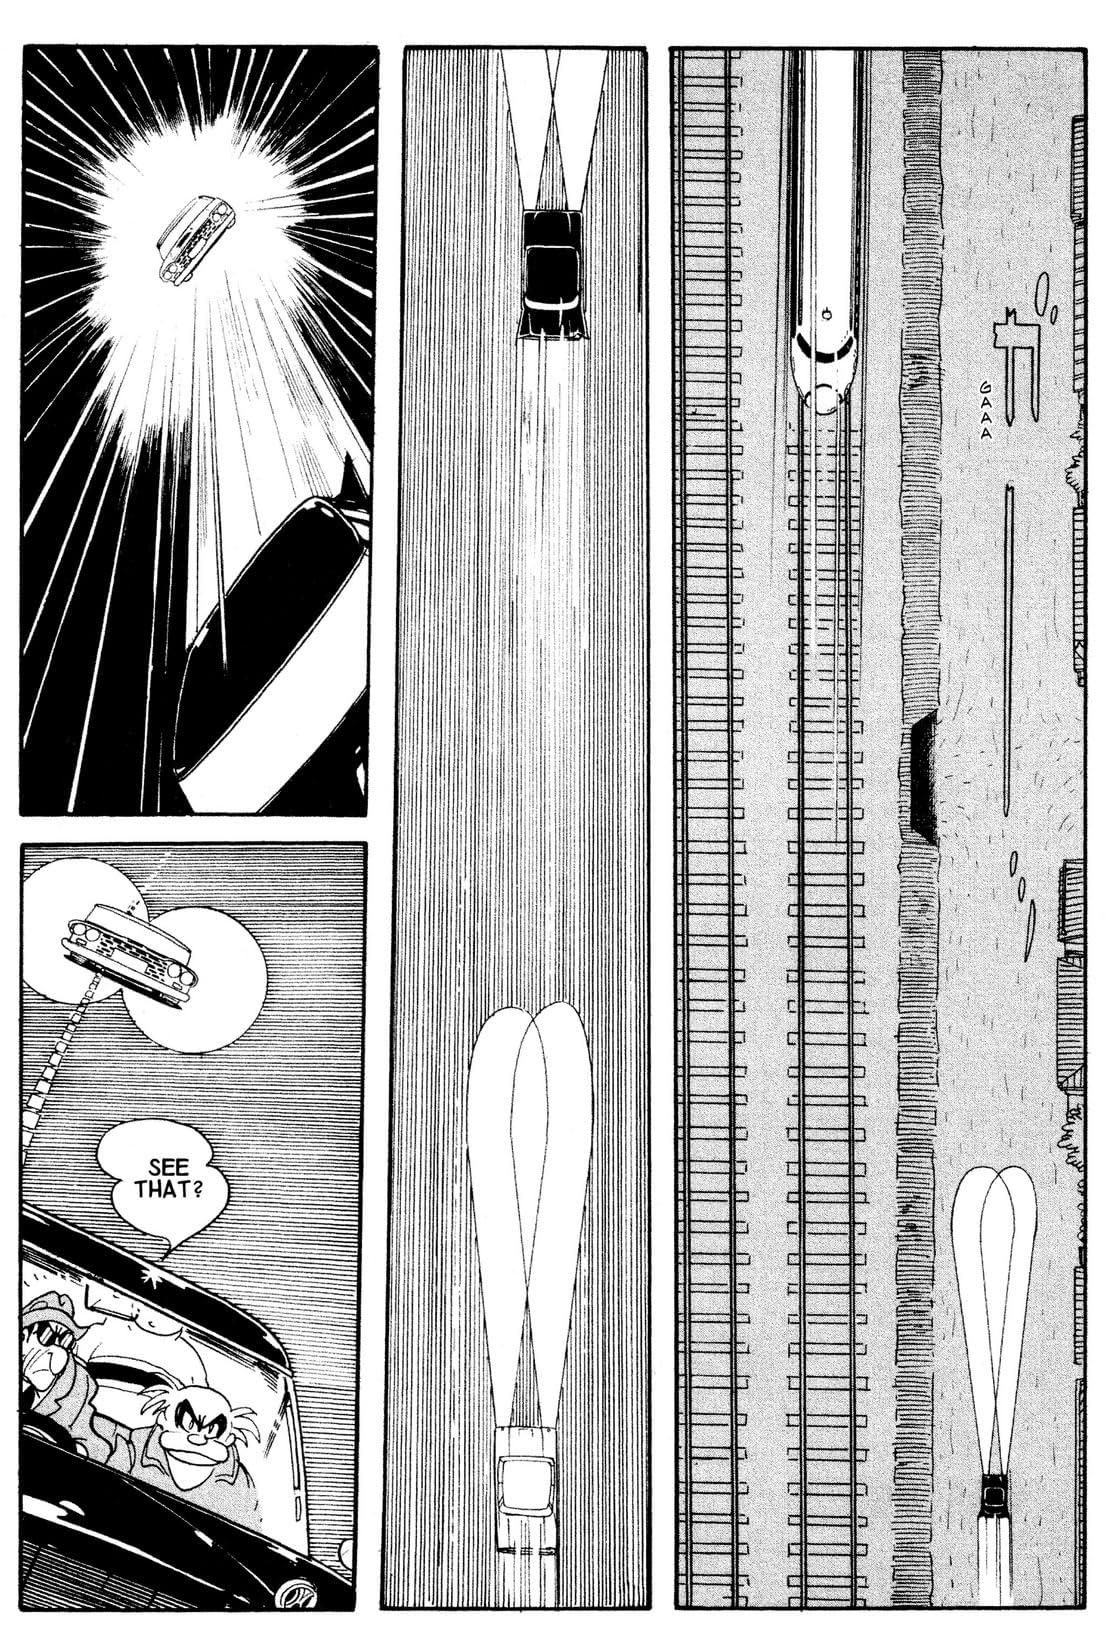 Cyborg 009 Vol. 3